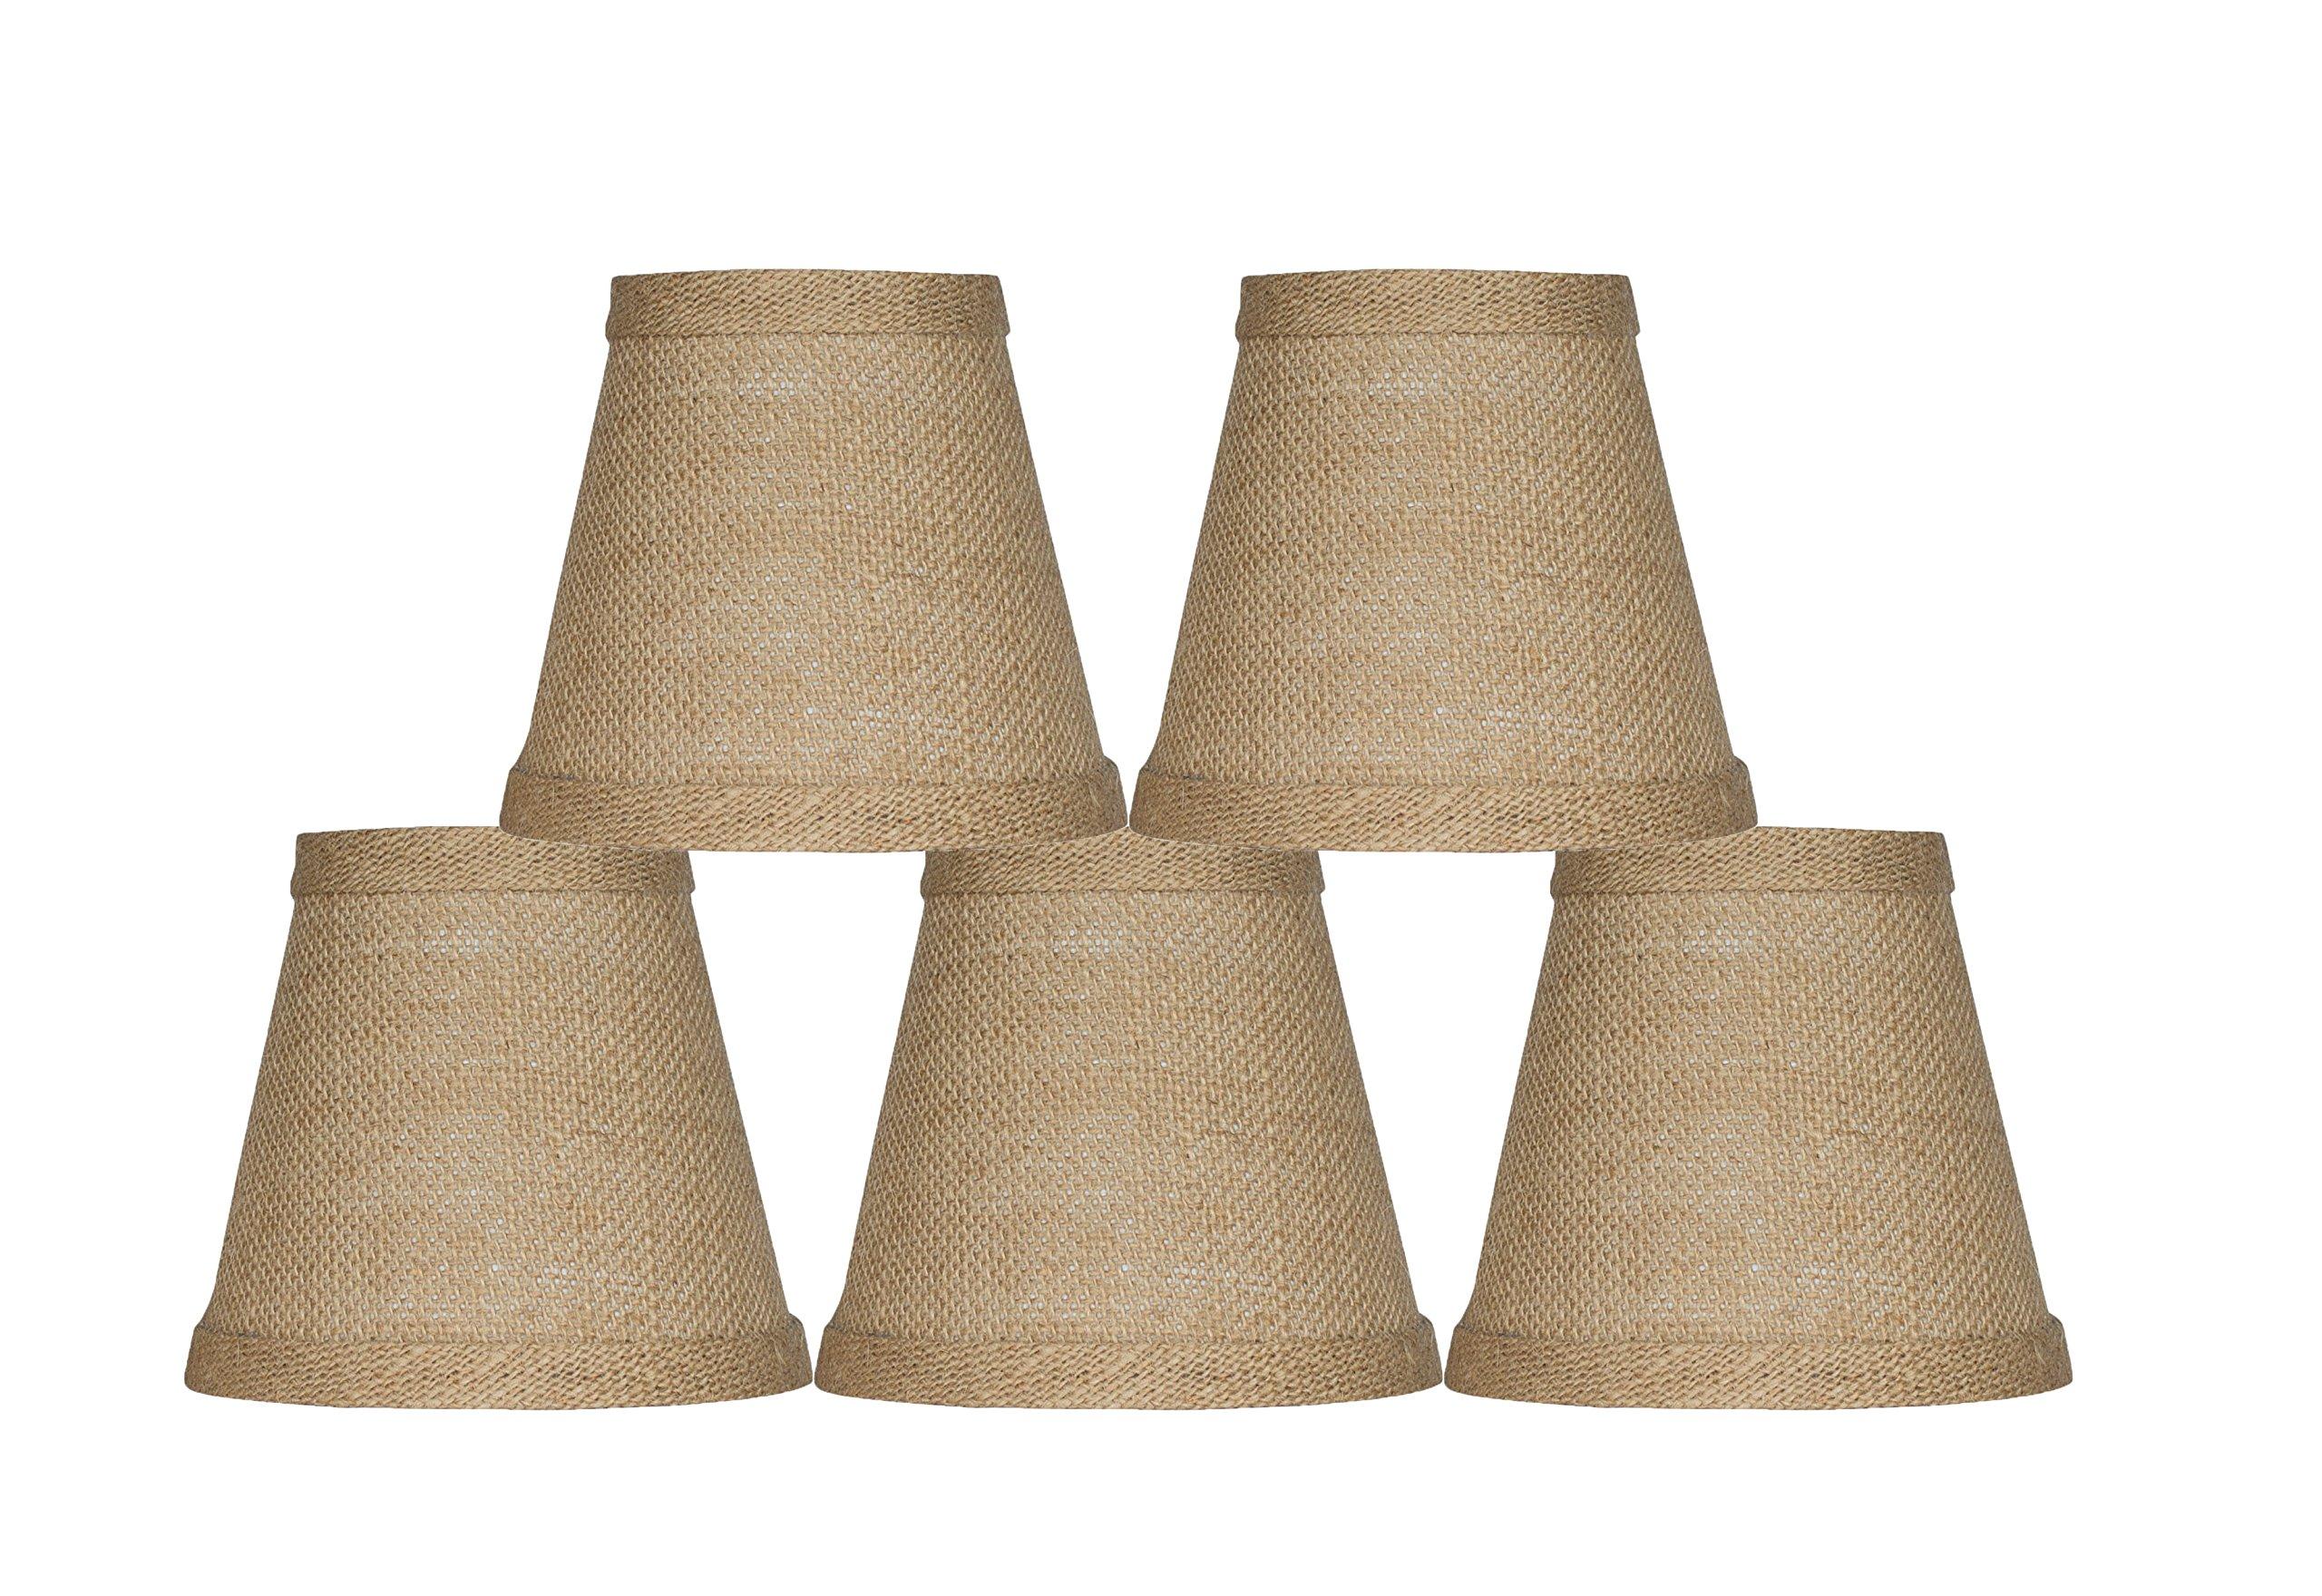 Urbanest Chandelier Lamp Shade 3x5x4.5'', Hardback, Clip On, Burlap (Set of 5)